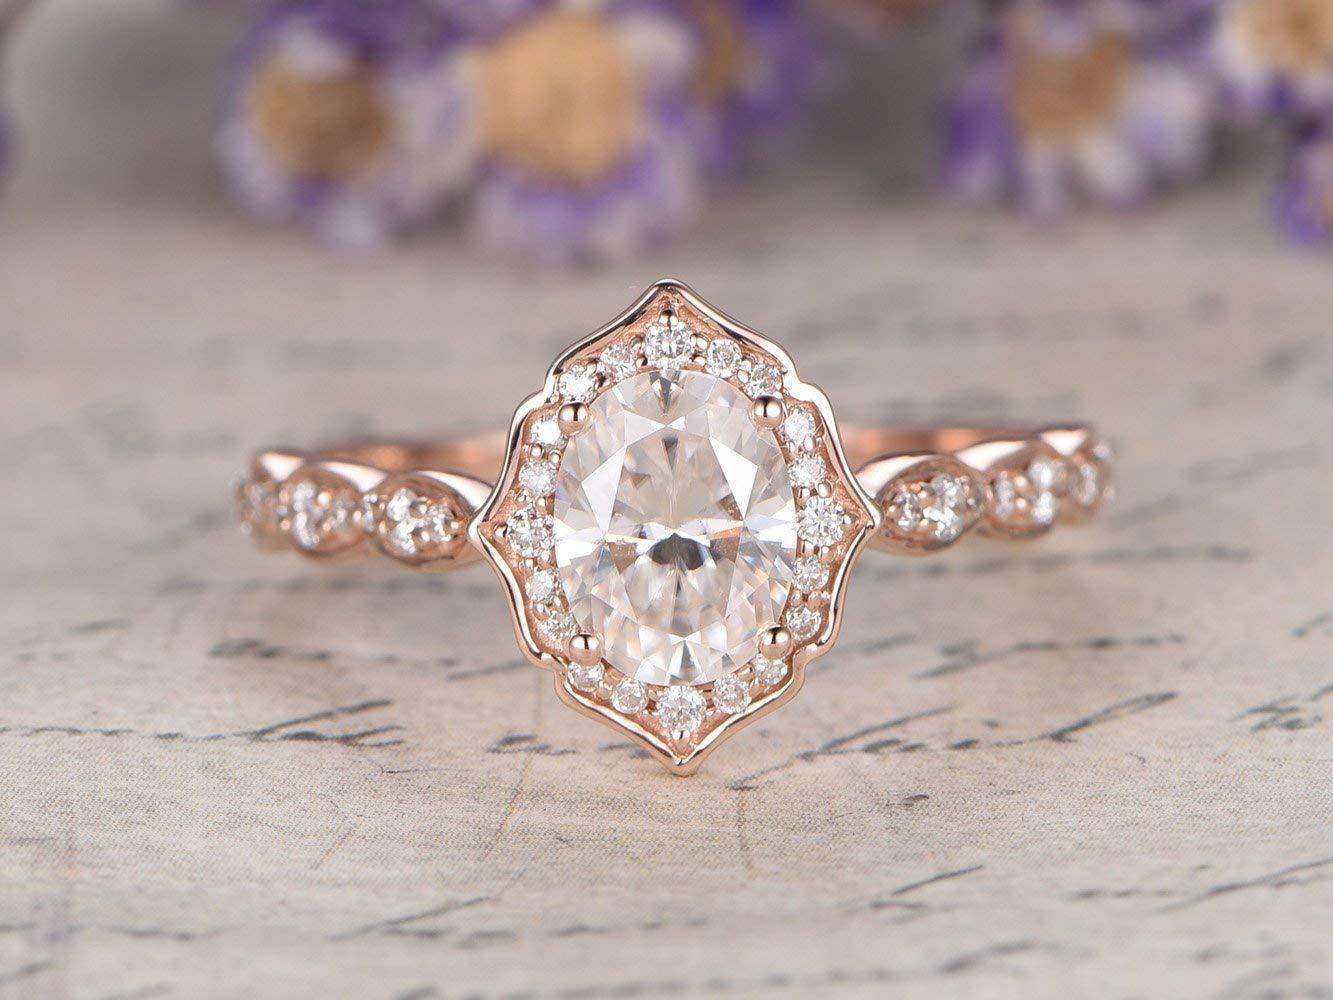 Moissanite Engagement Ring Oval Engagement Ring Vintage Engagement Ring Solid 14K Gold Engagement Ring Oval Moissanite Engagement Ring